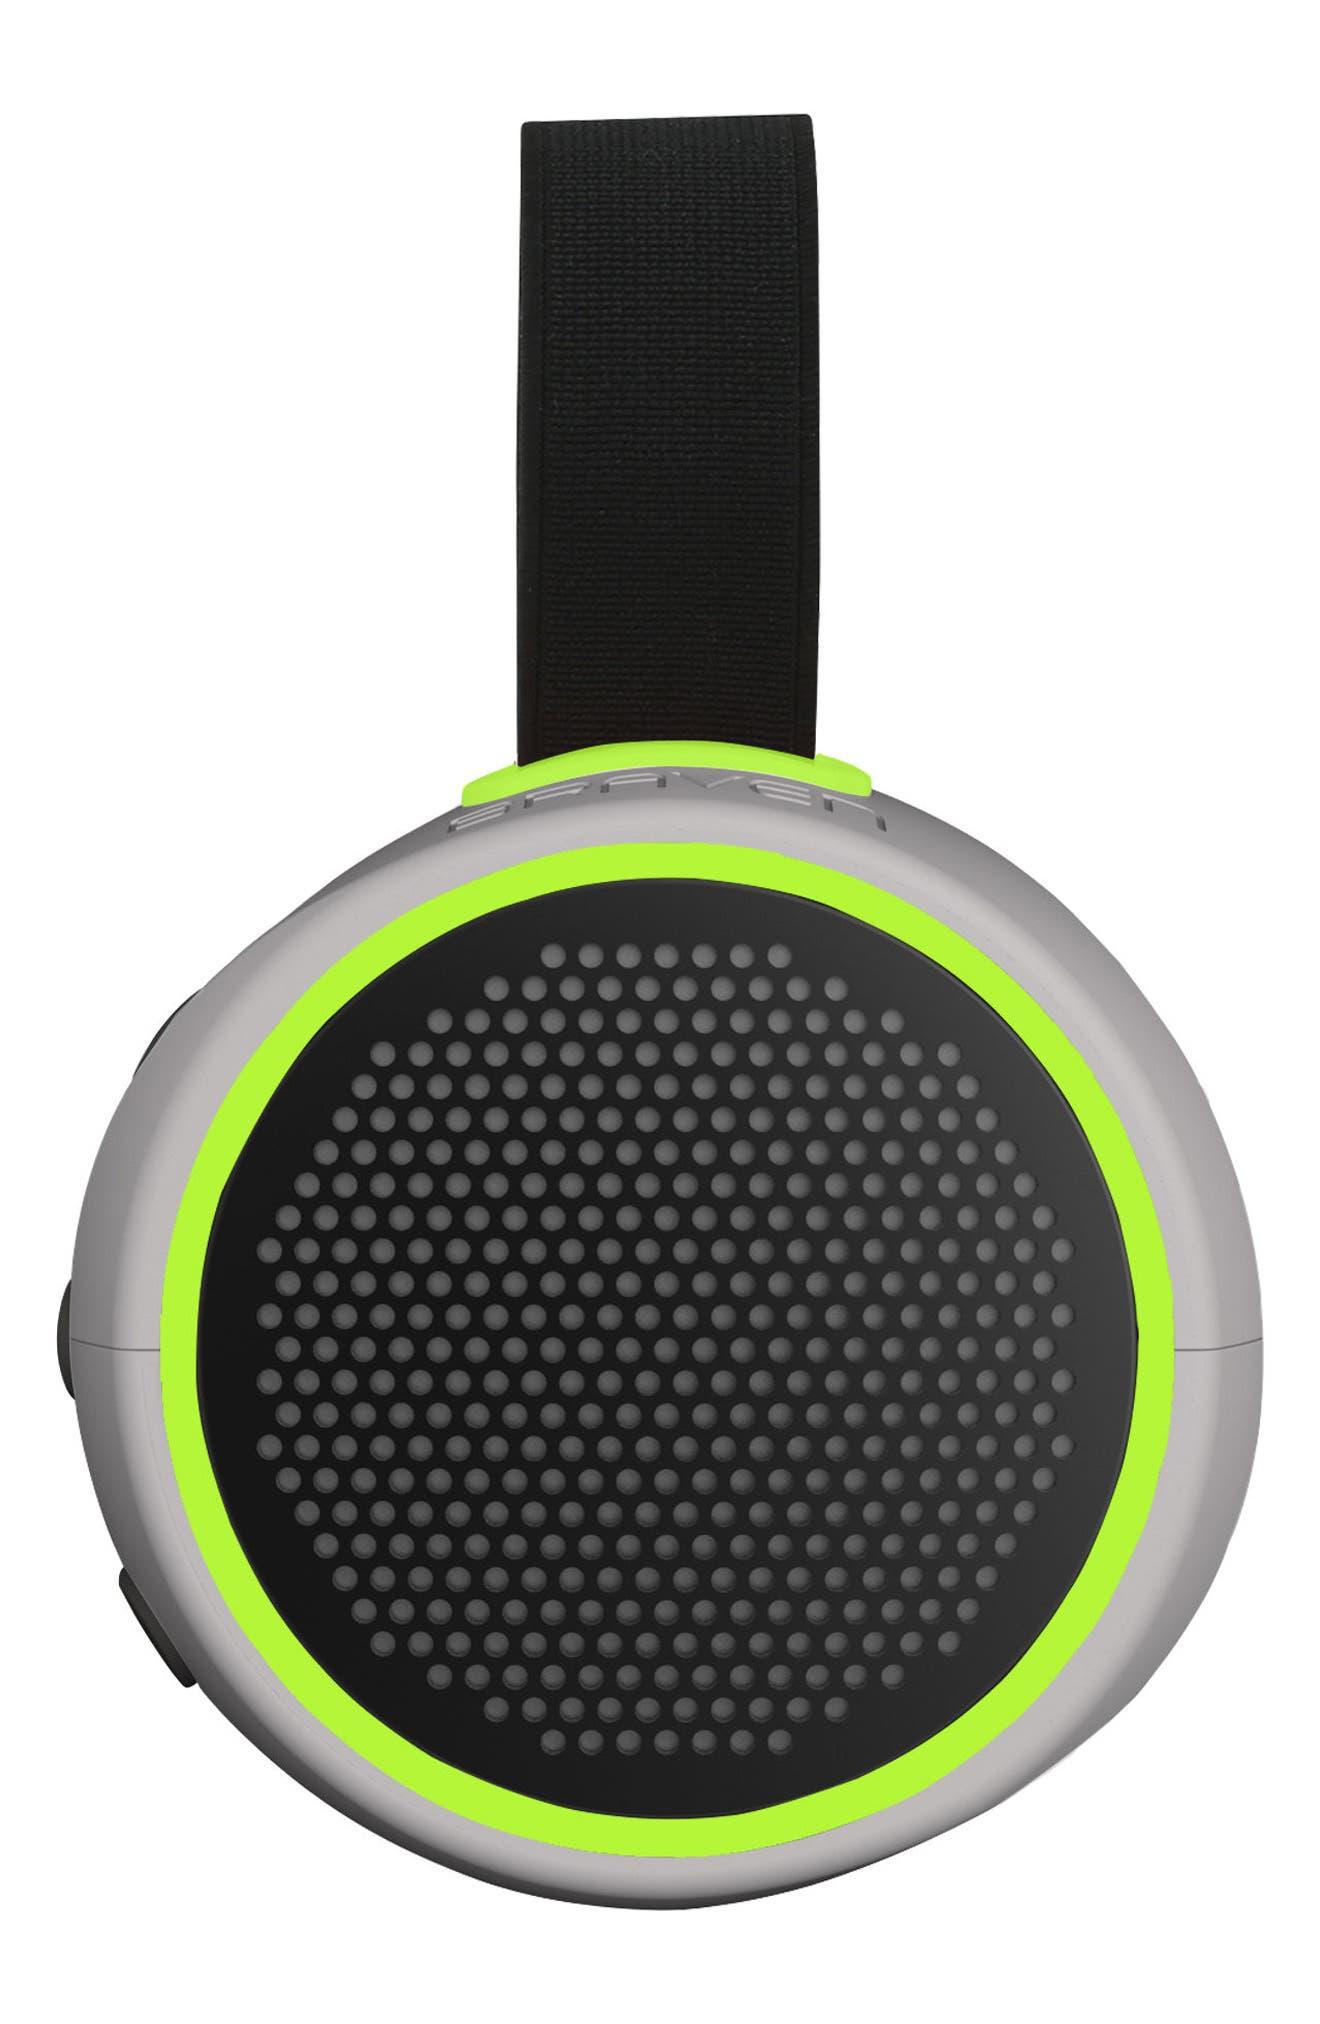 105 Portable Waterproof Bluetooth Speaker,                             Main thumbnail 1, color,                             Silver/ Green